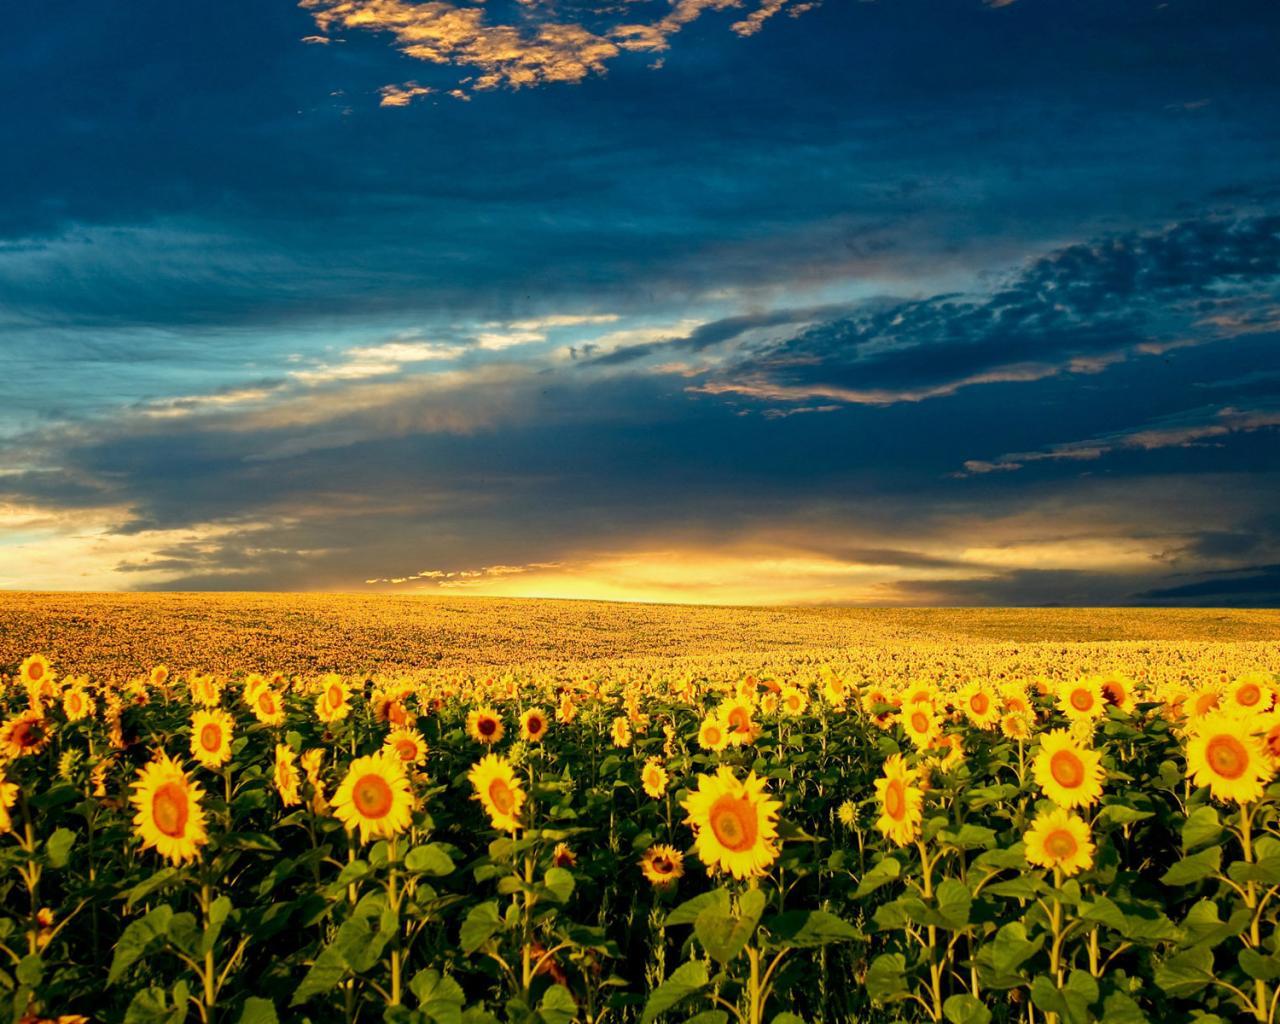 Подсолнух солнце лето природа обои